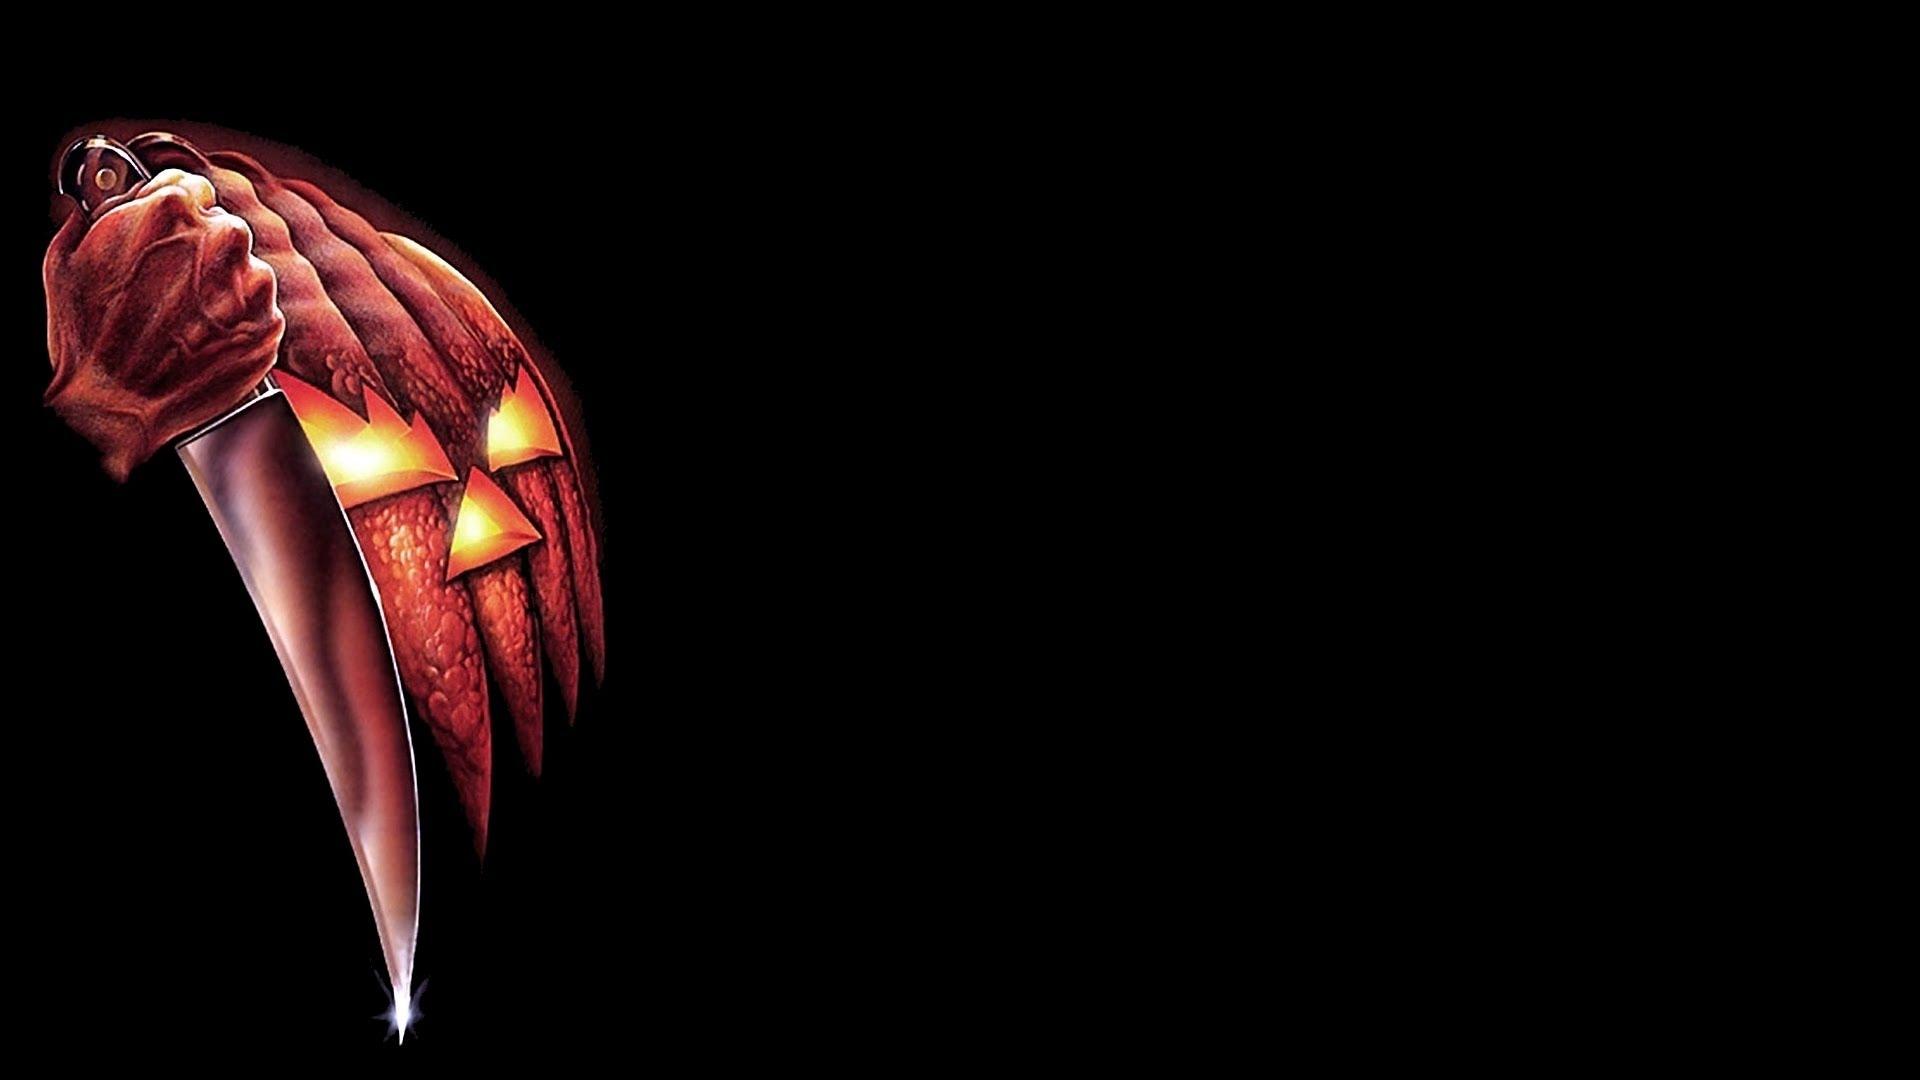 Halloween (1978) wallpapers, Movie, HQ Halloween (1978